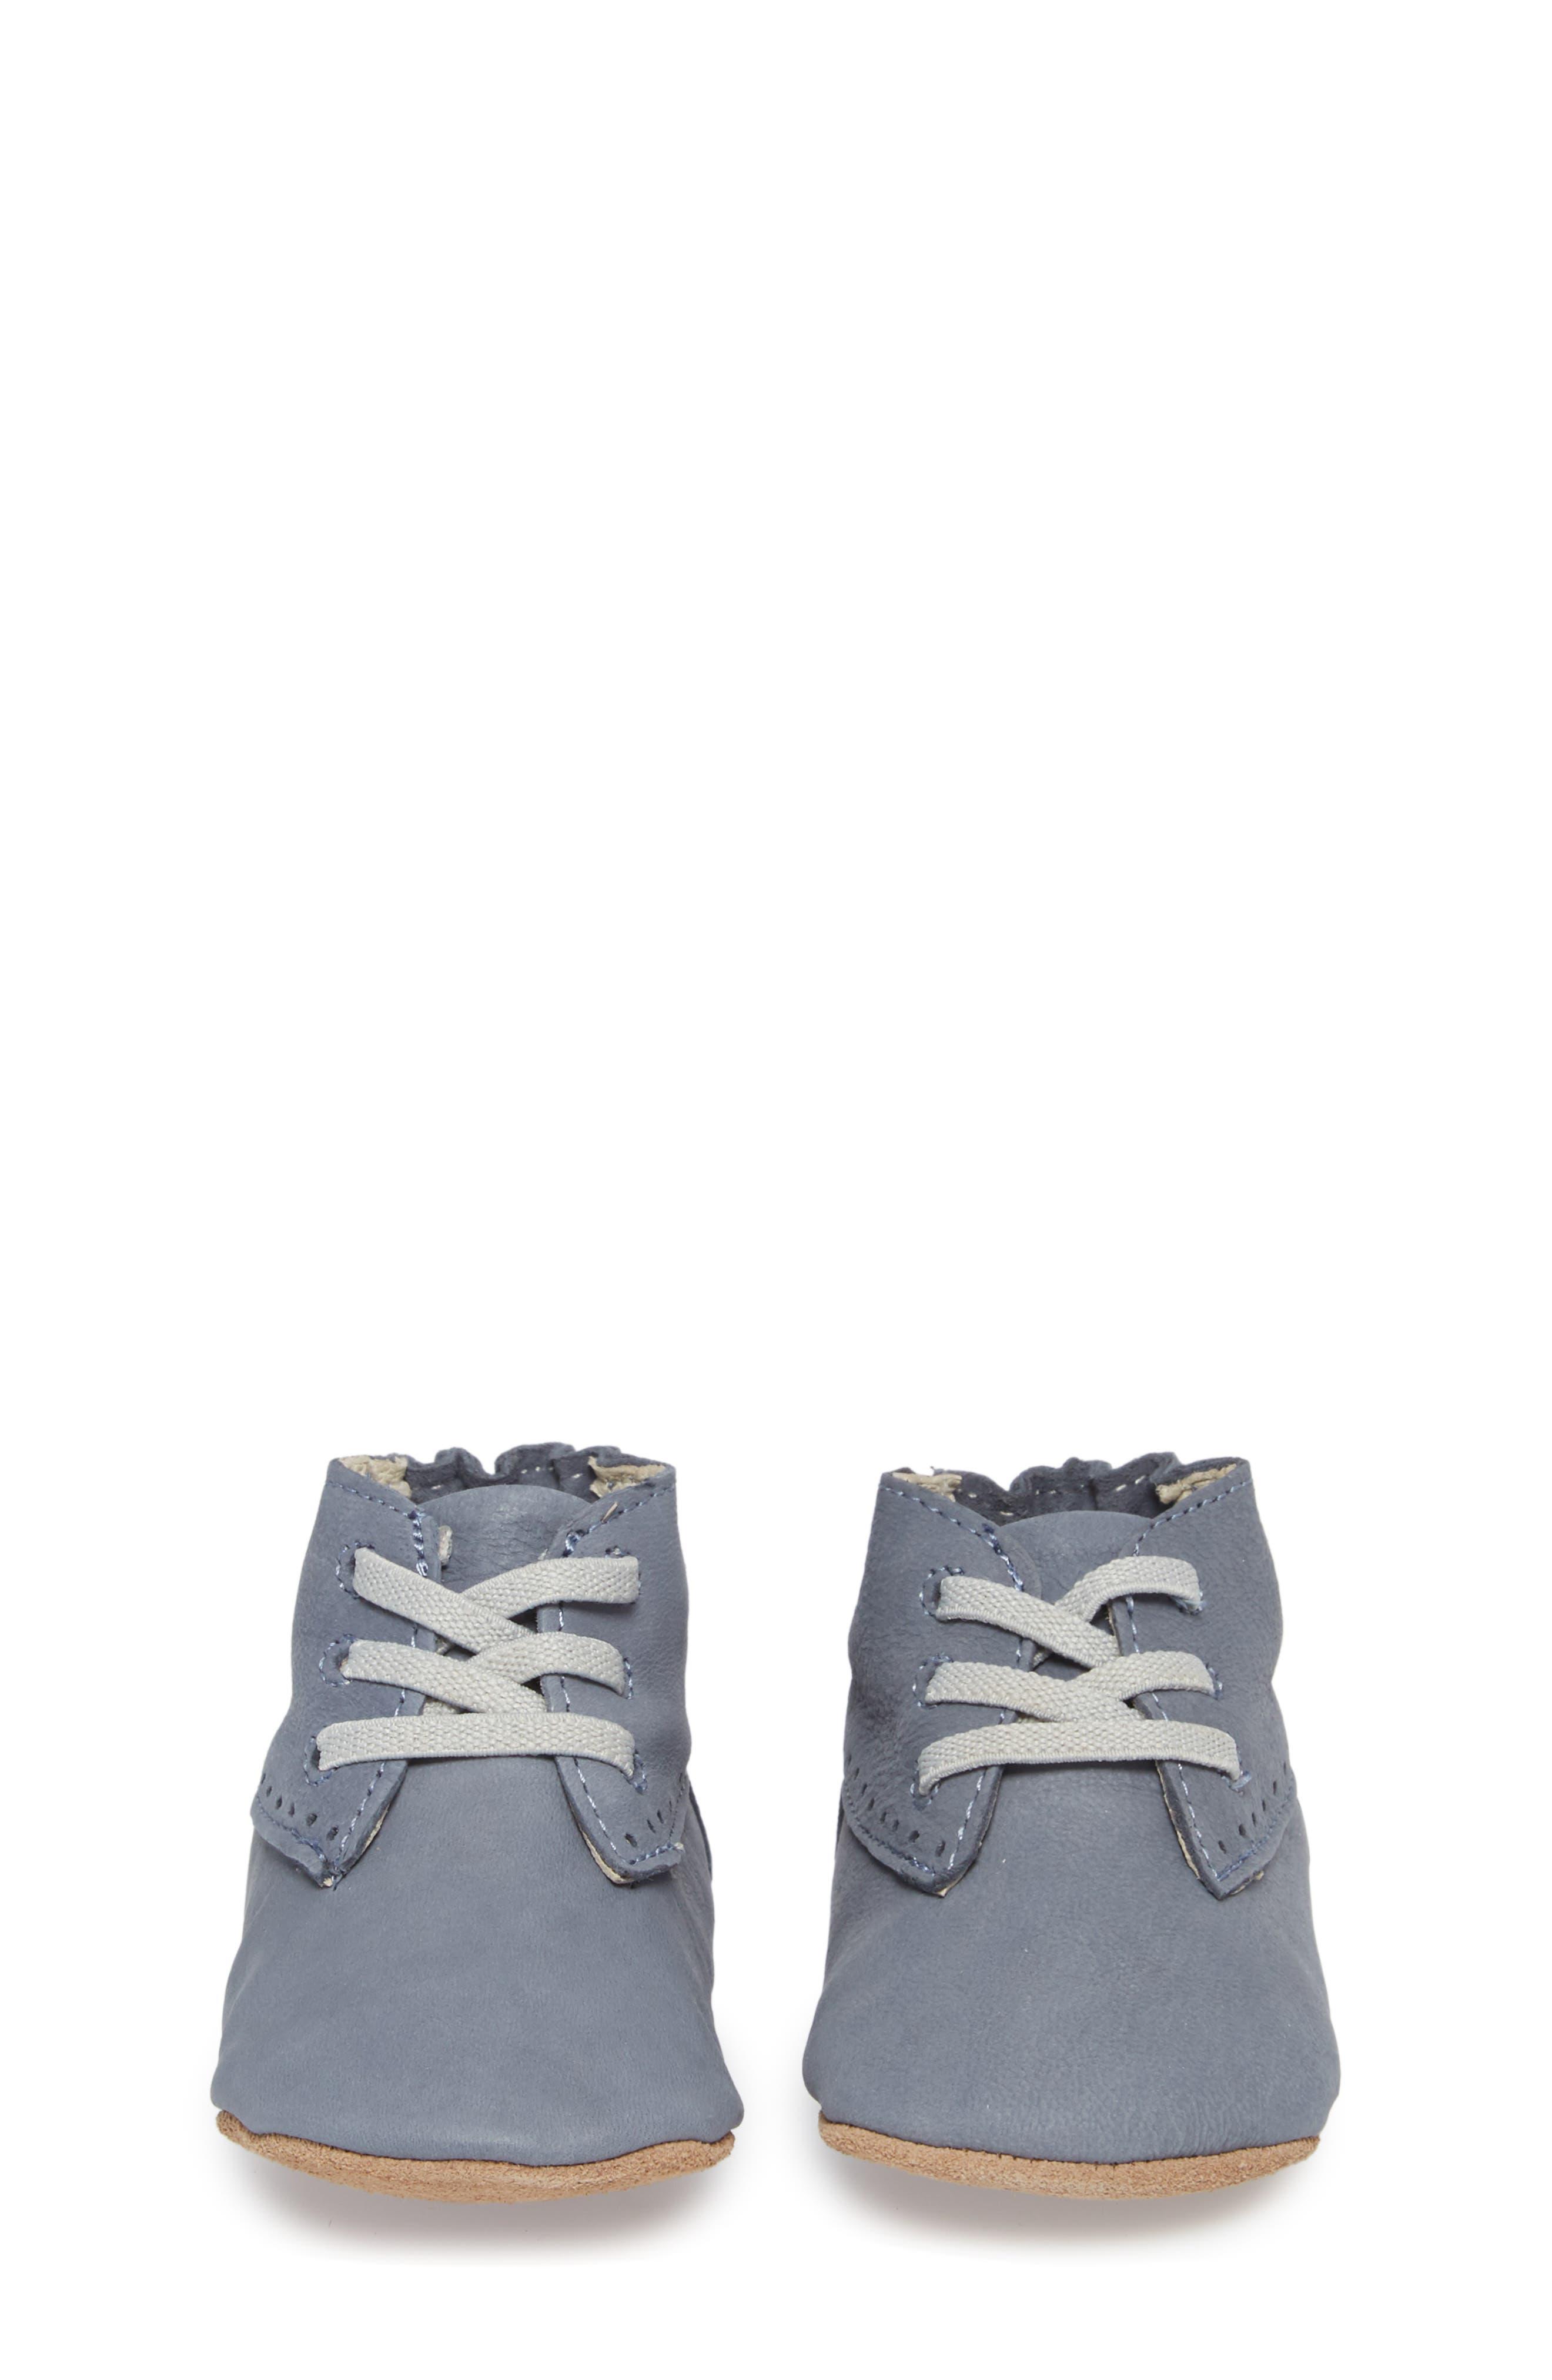 William Chukka Boot Crib Shoe,                             Alternate thumbnail 4, color,                             Blue